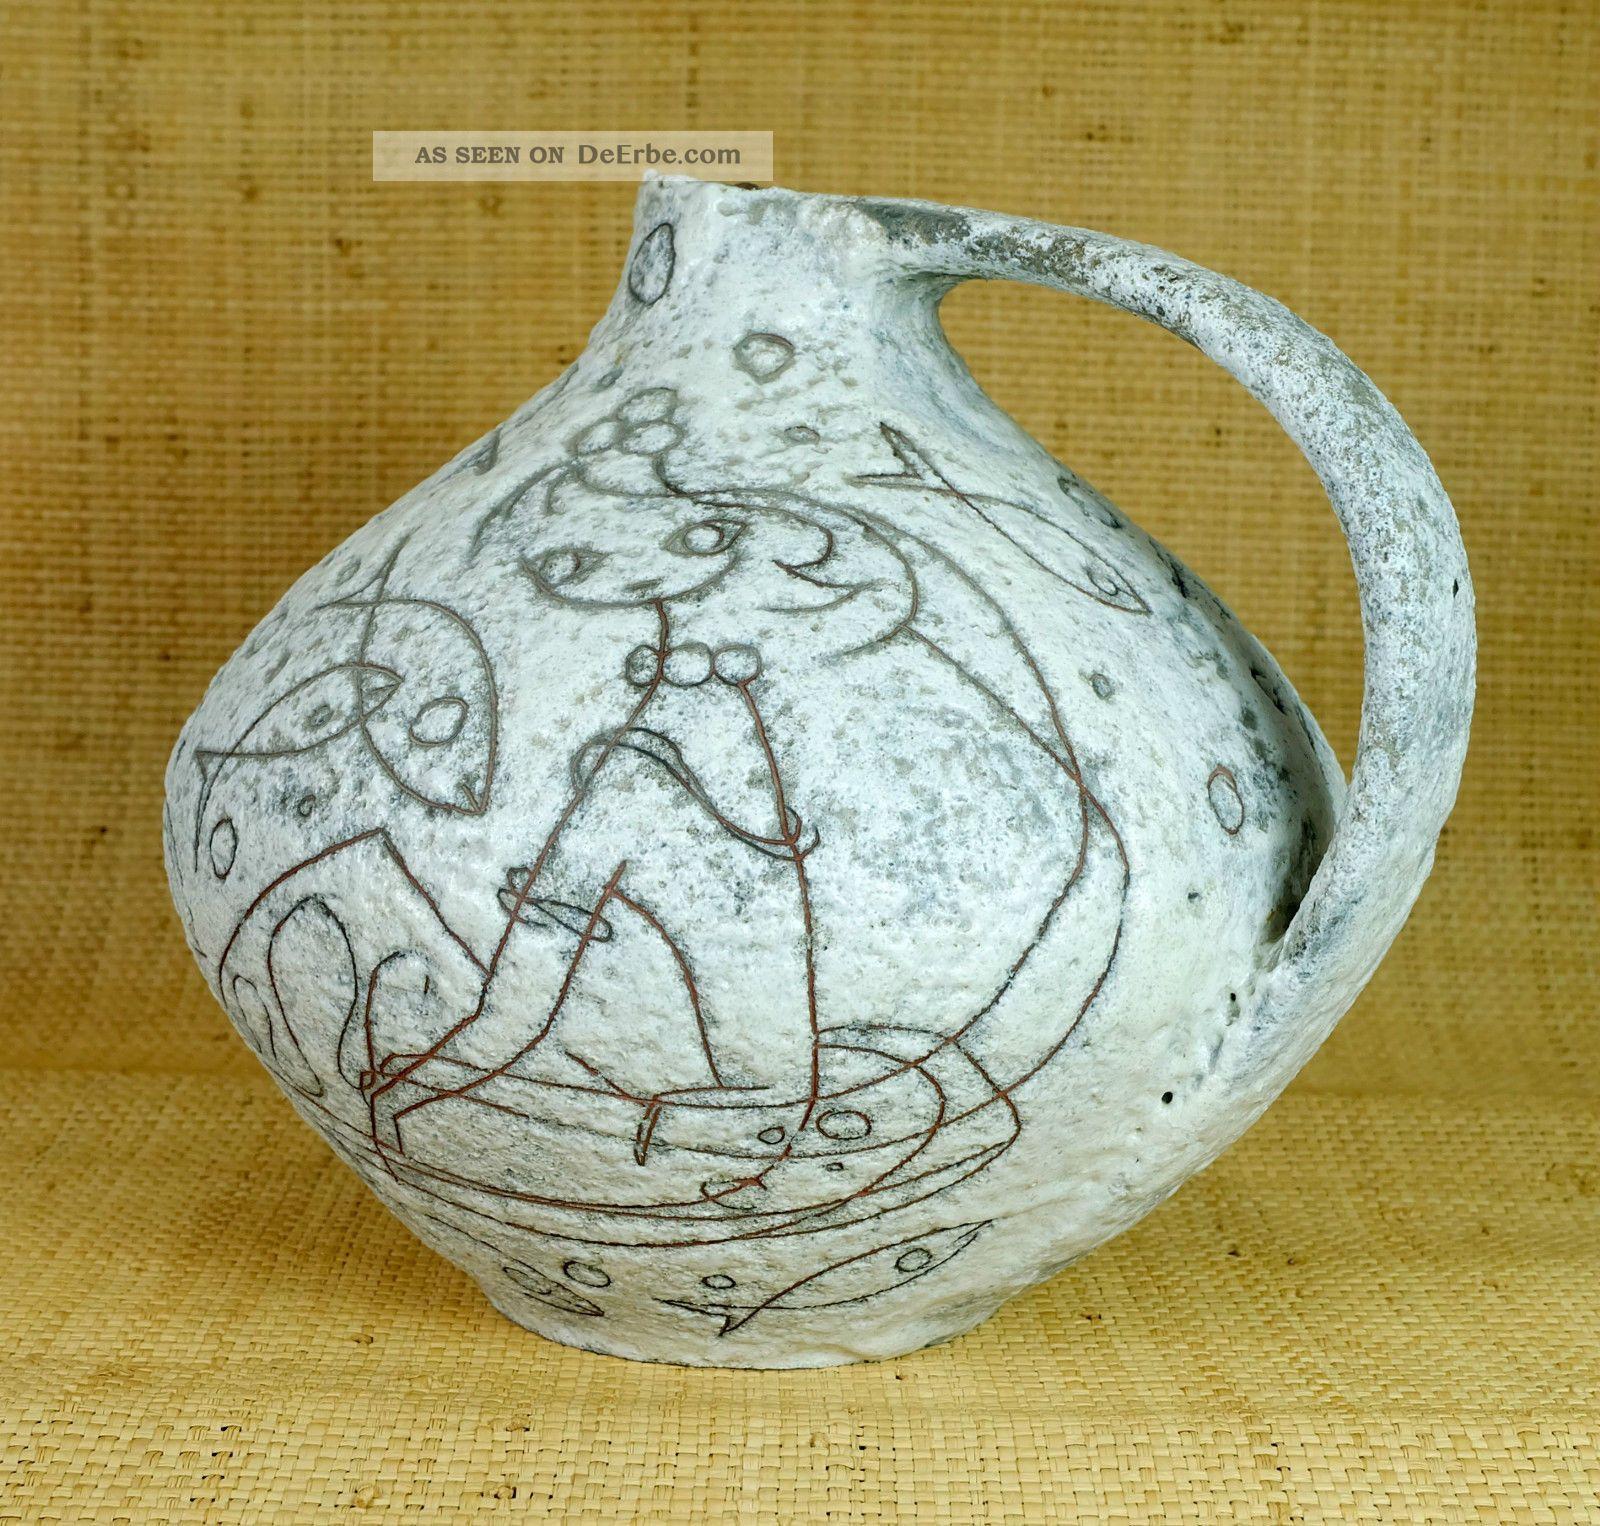 Imposante Vase Ruscha Dekor Filigran Adele Bolz 50er Jahre